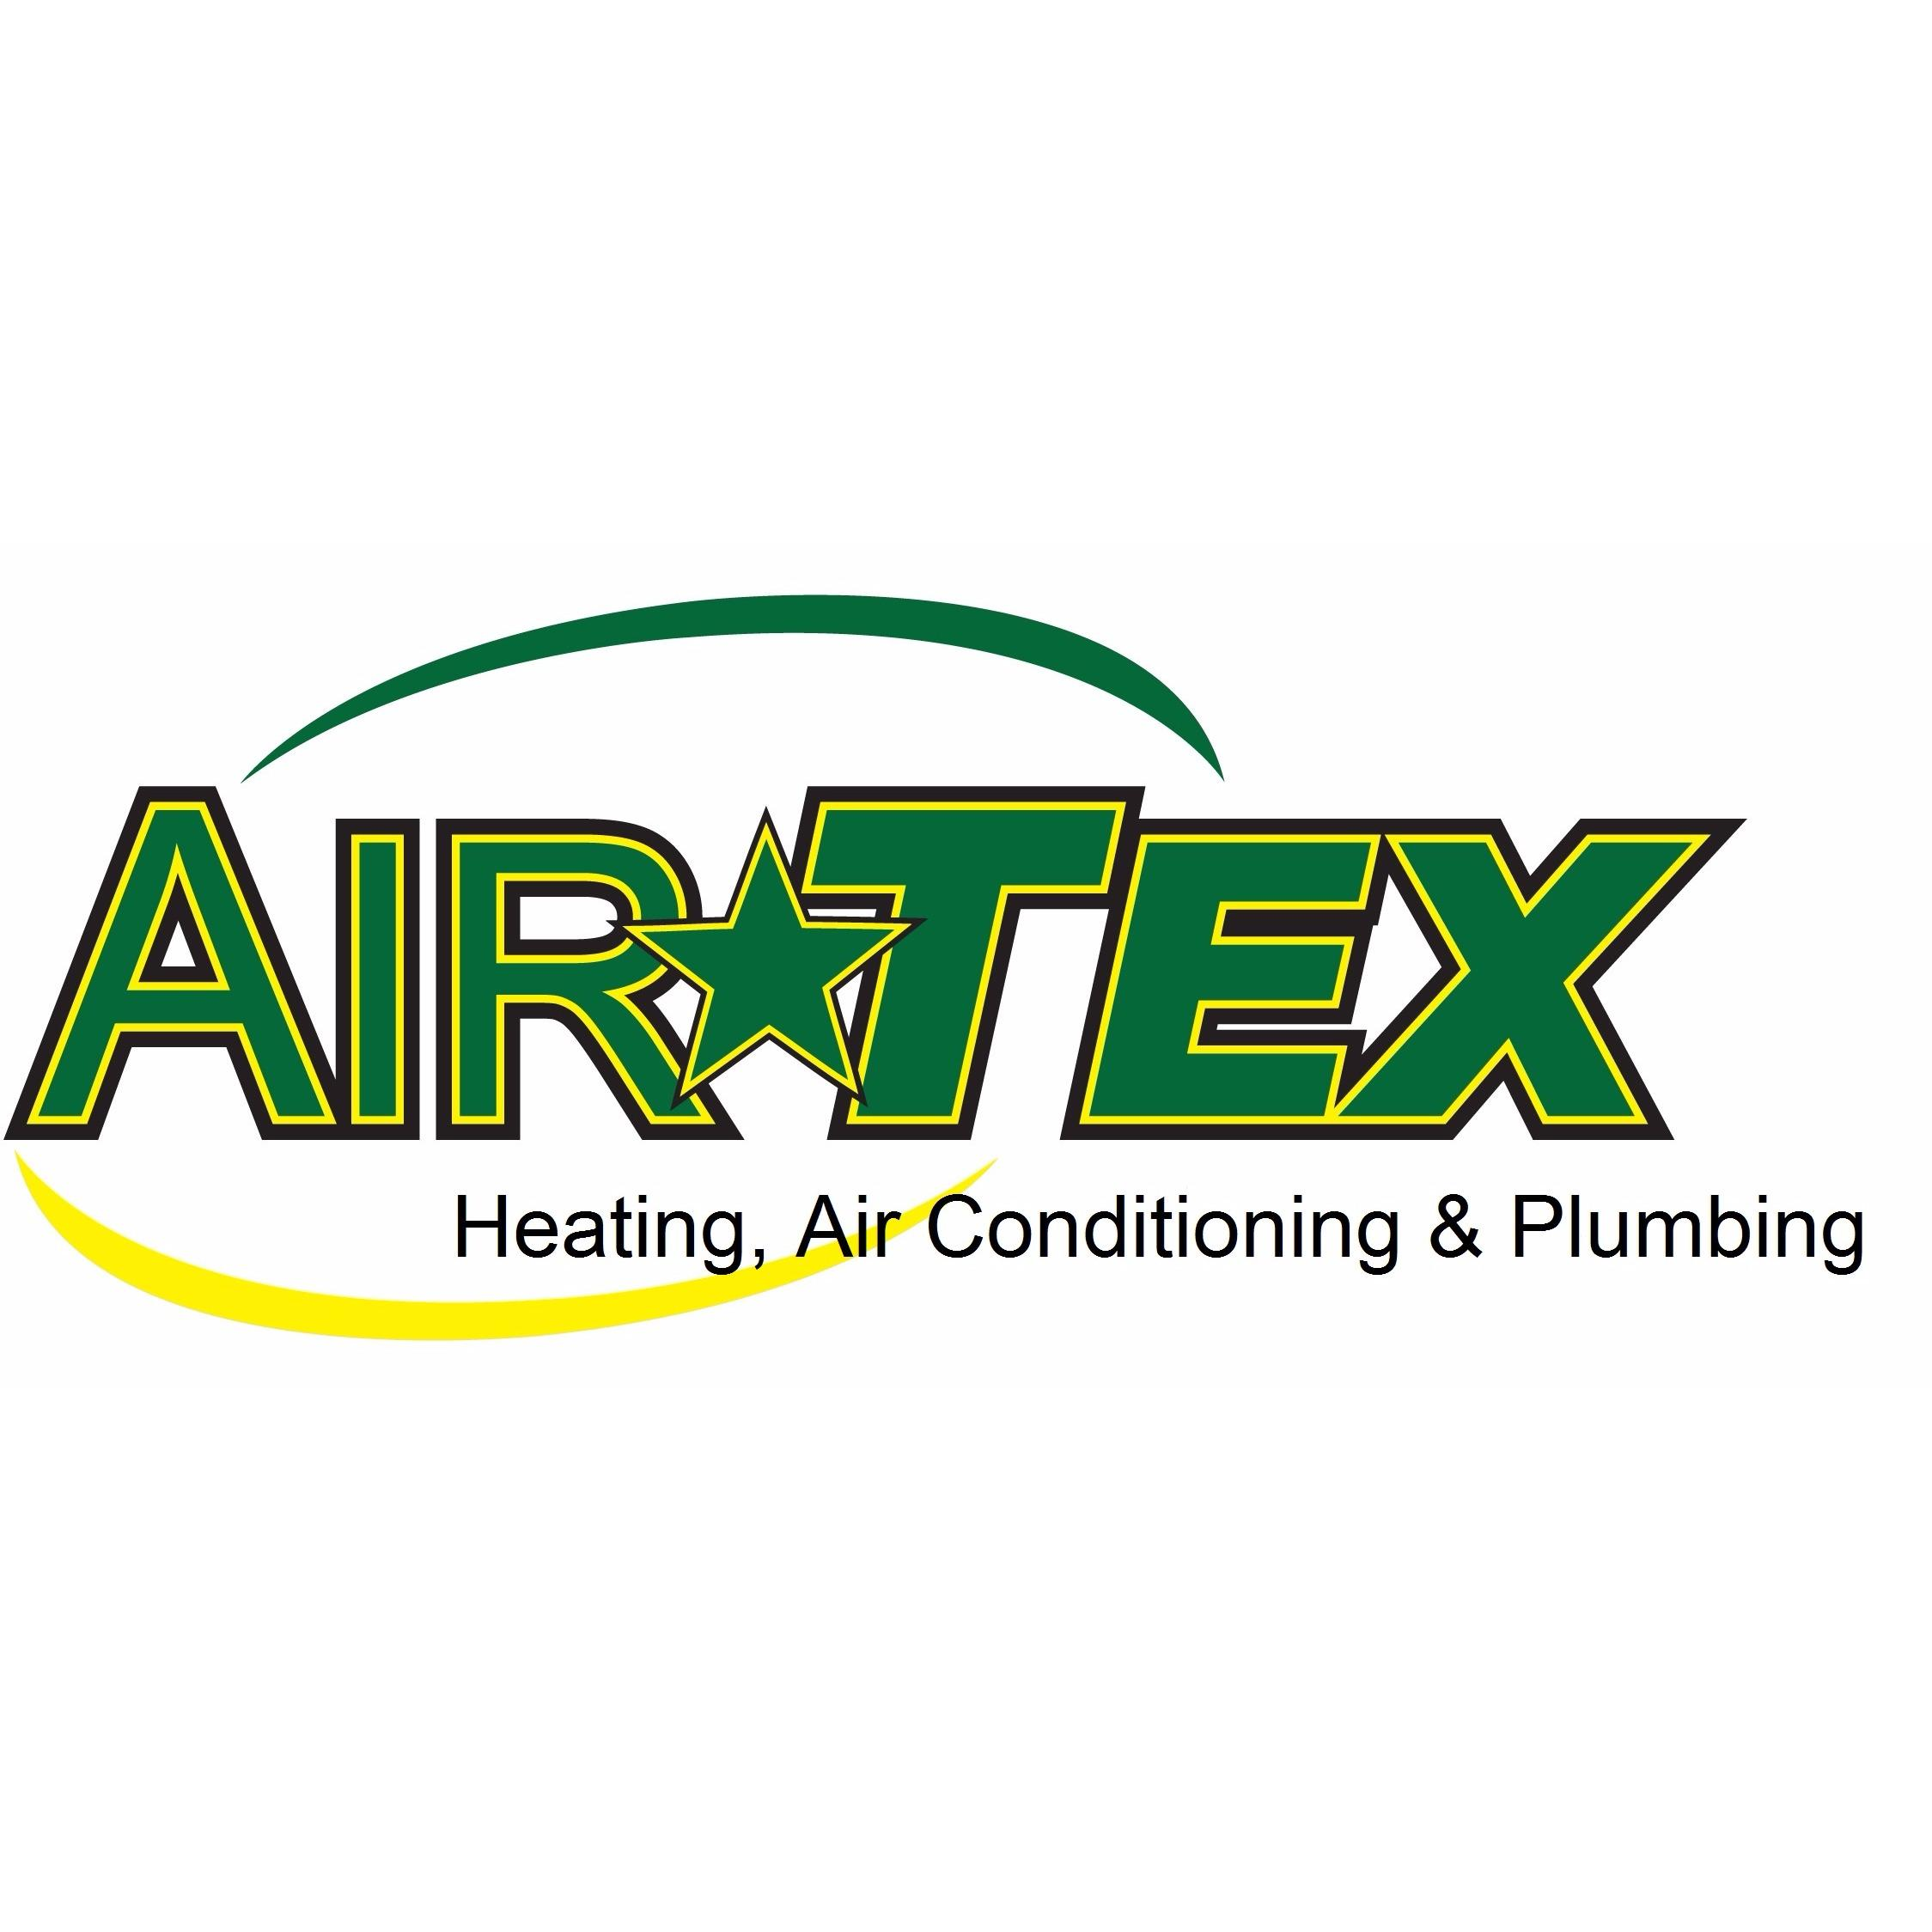 Air-Tex Heating, Air Conditioning & Plumbing